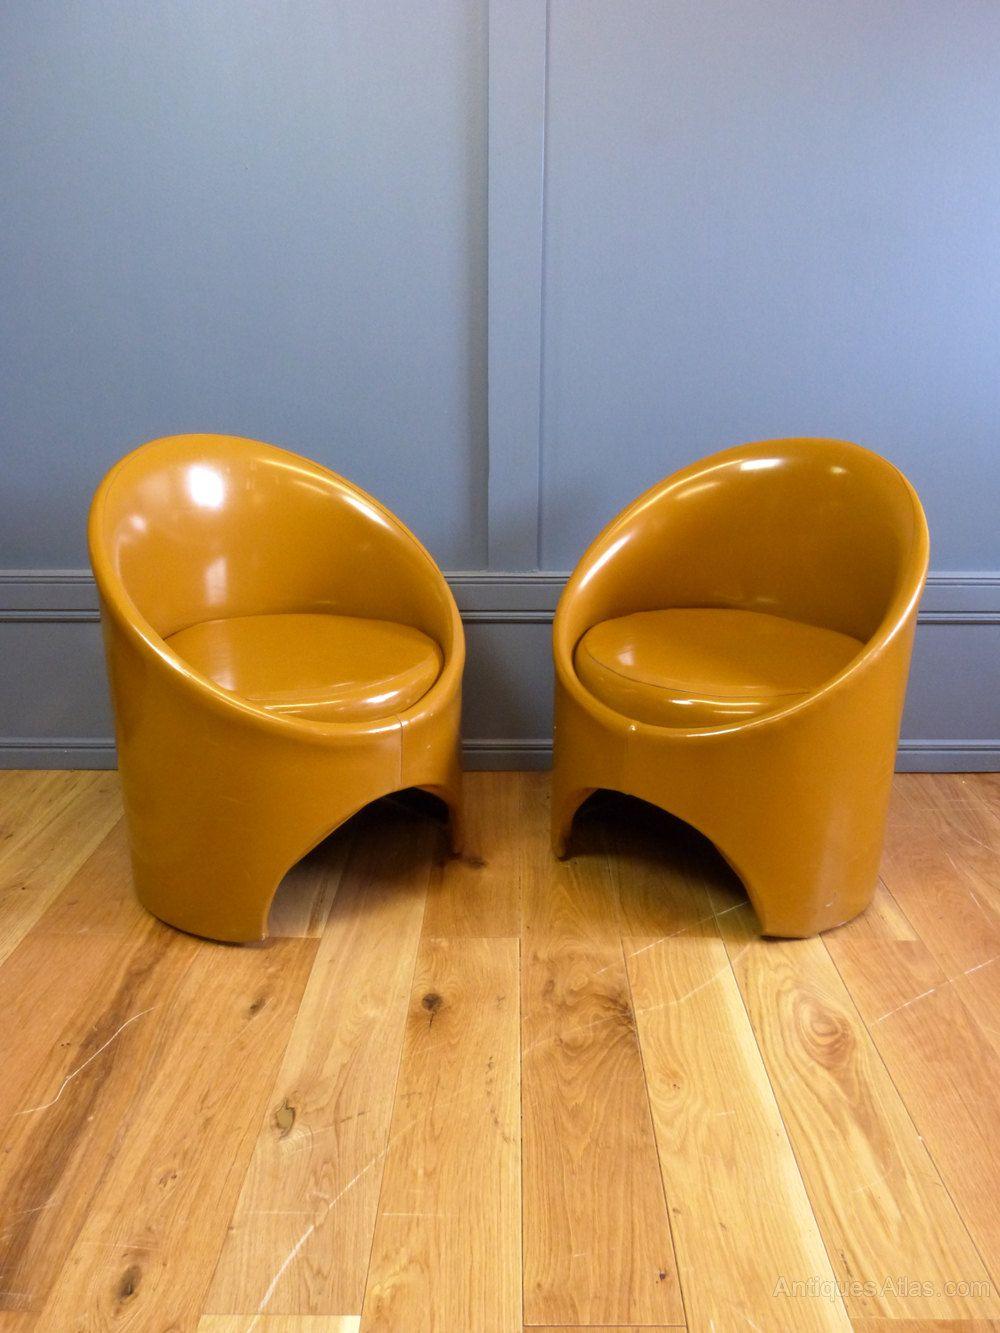 tub chairs brown leather | Minimalist Home Design | Pinterest | Tub ...